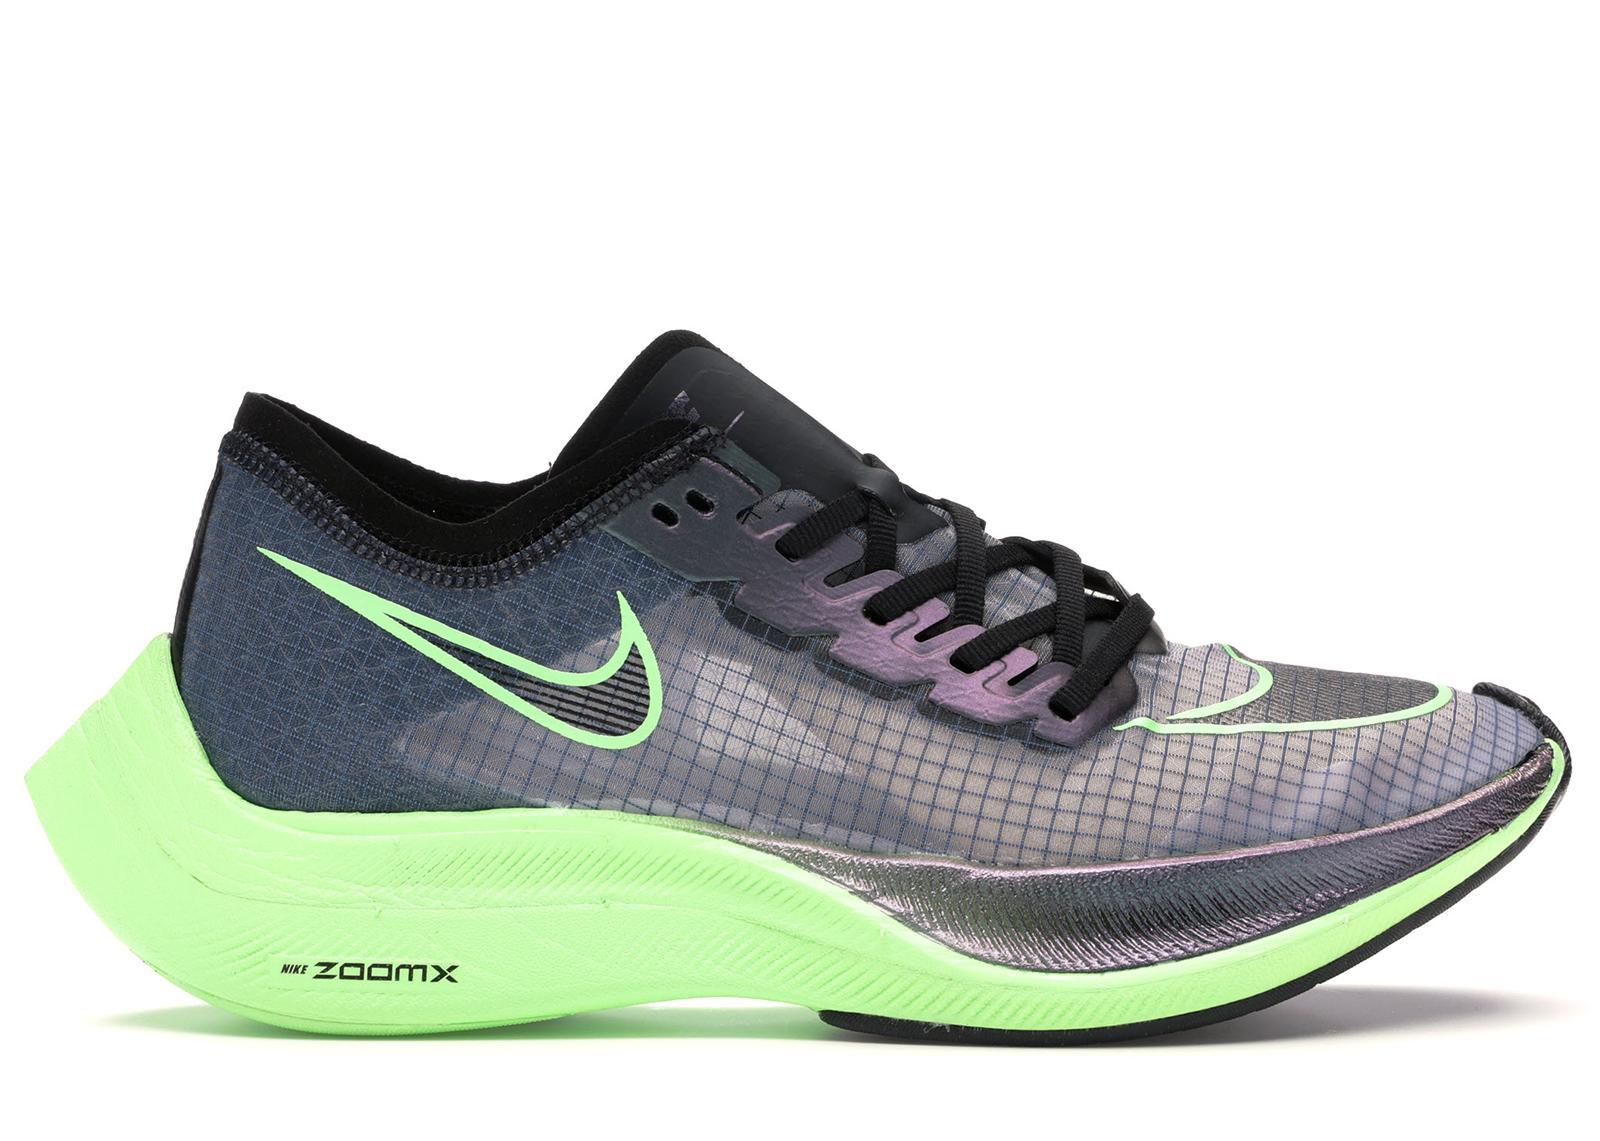 Nike ZoomX VaporFly Next% Valerian Blue